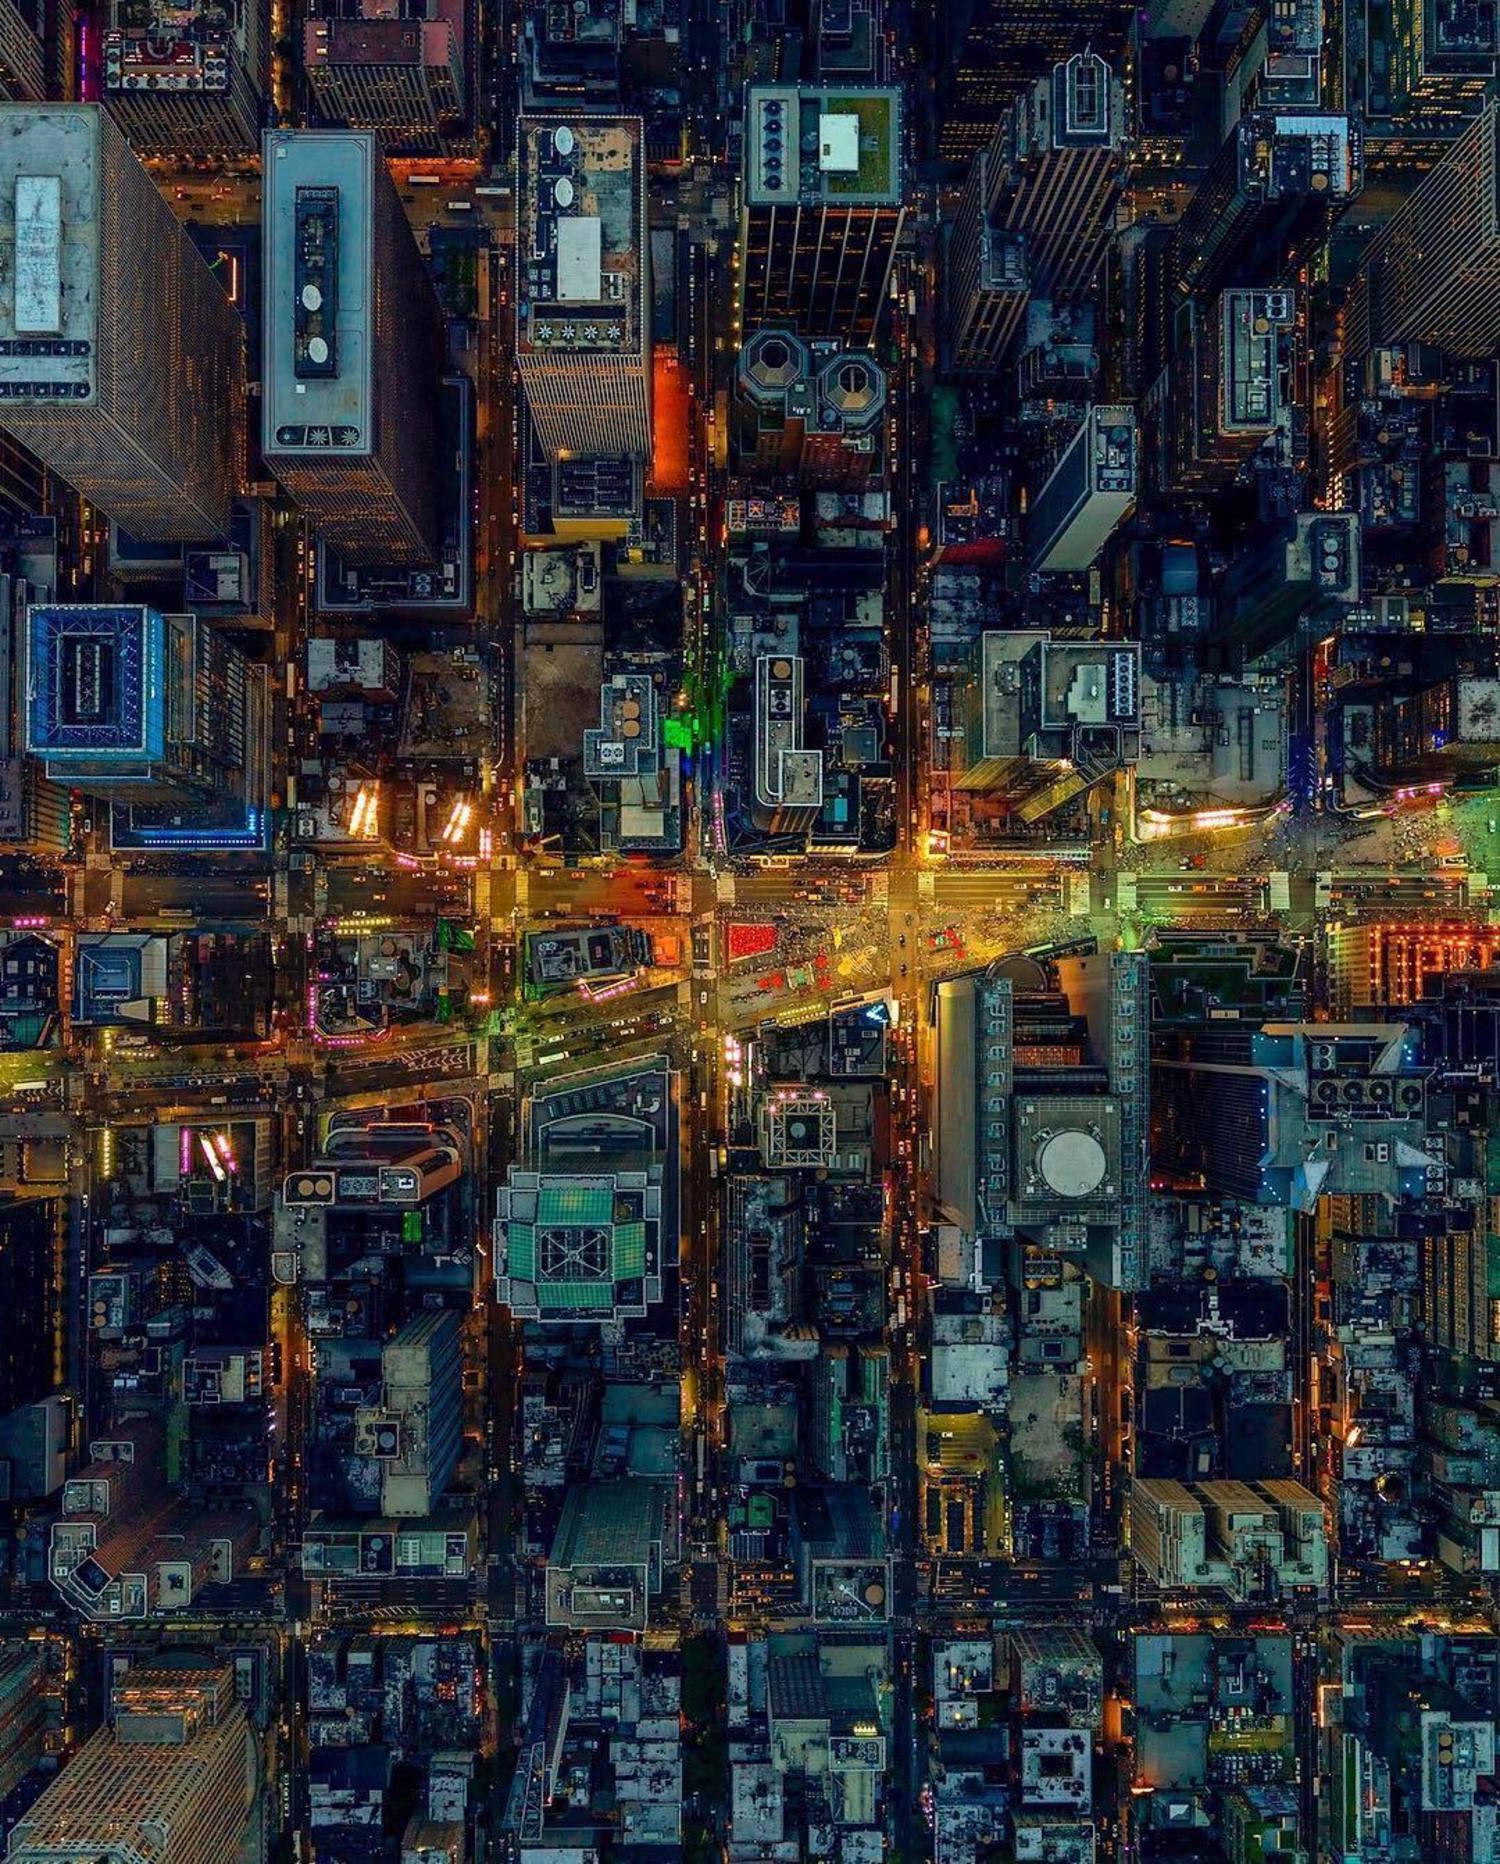 Times Square, Manhattan. 📸 @jeffreymilstein #viewingnyc #nyc #newyork #newyorkcity #timessquare